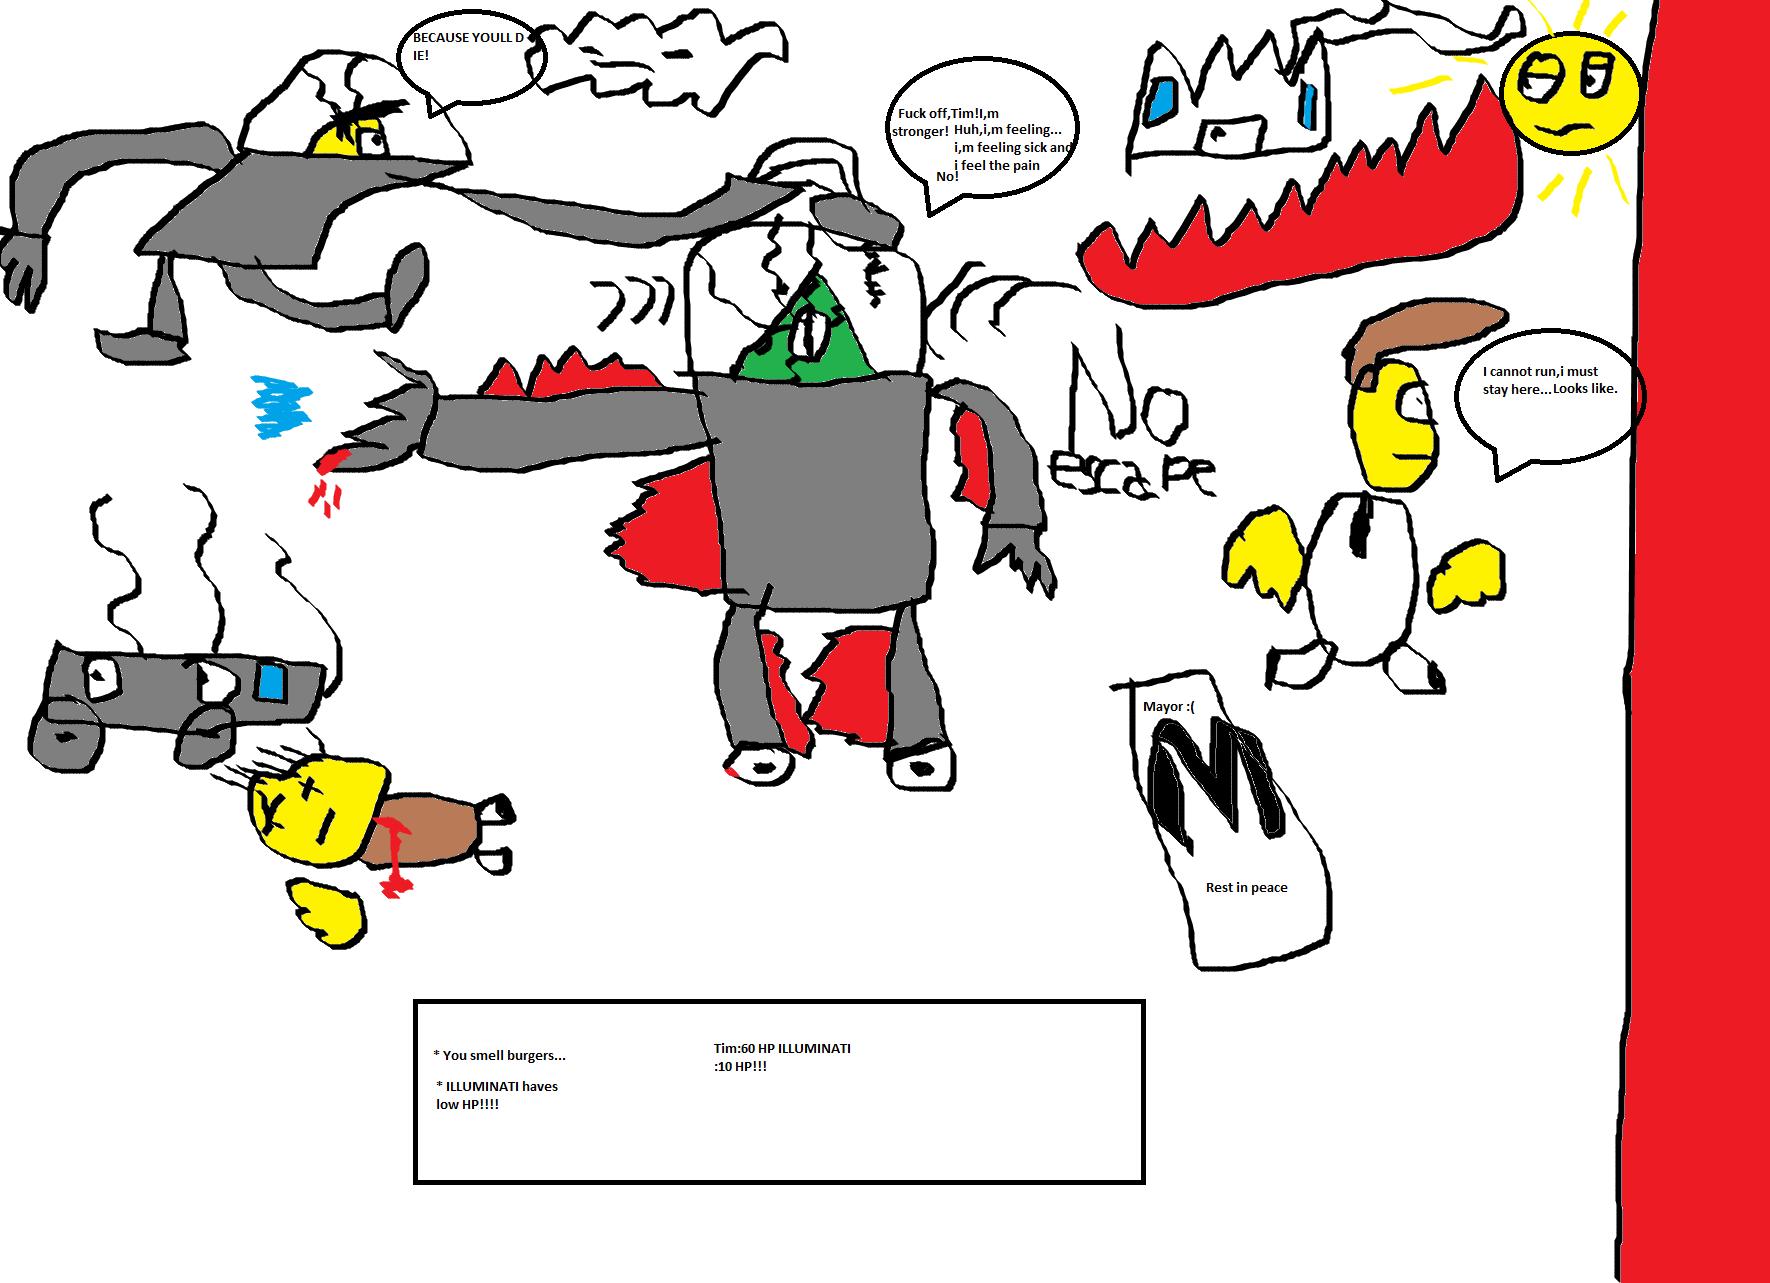 Tim vs ILLUMINATI Robot fight